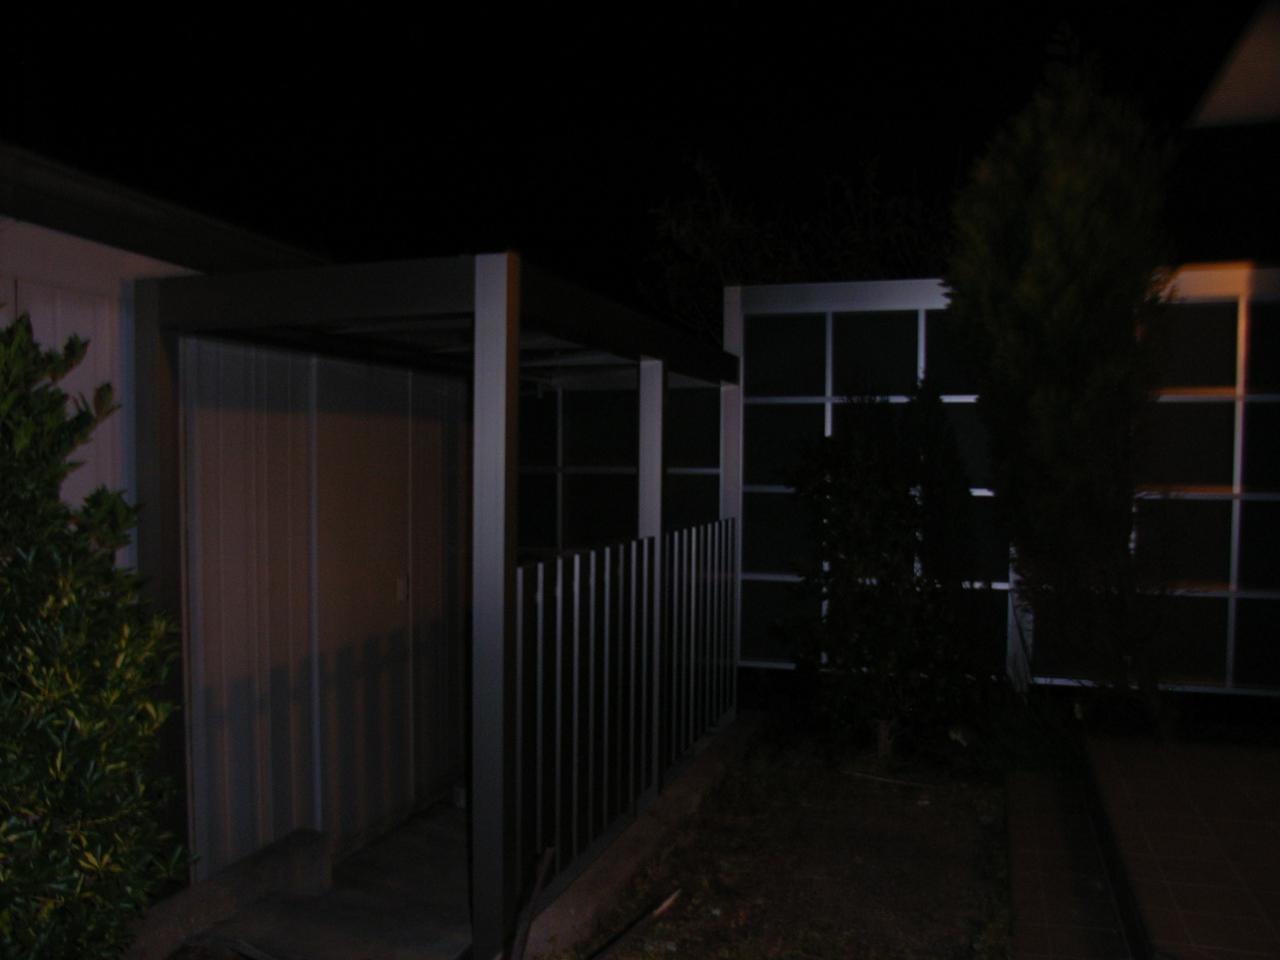 20091225 003